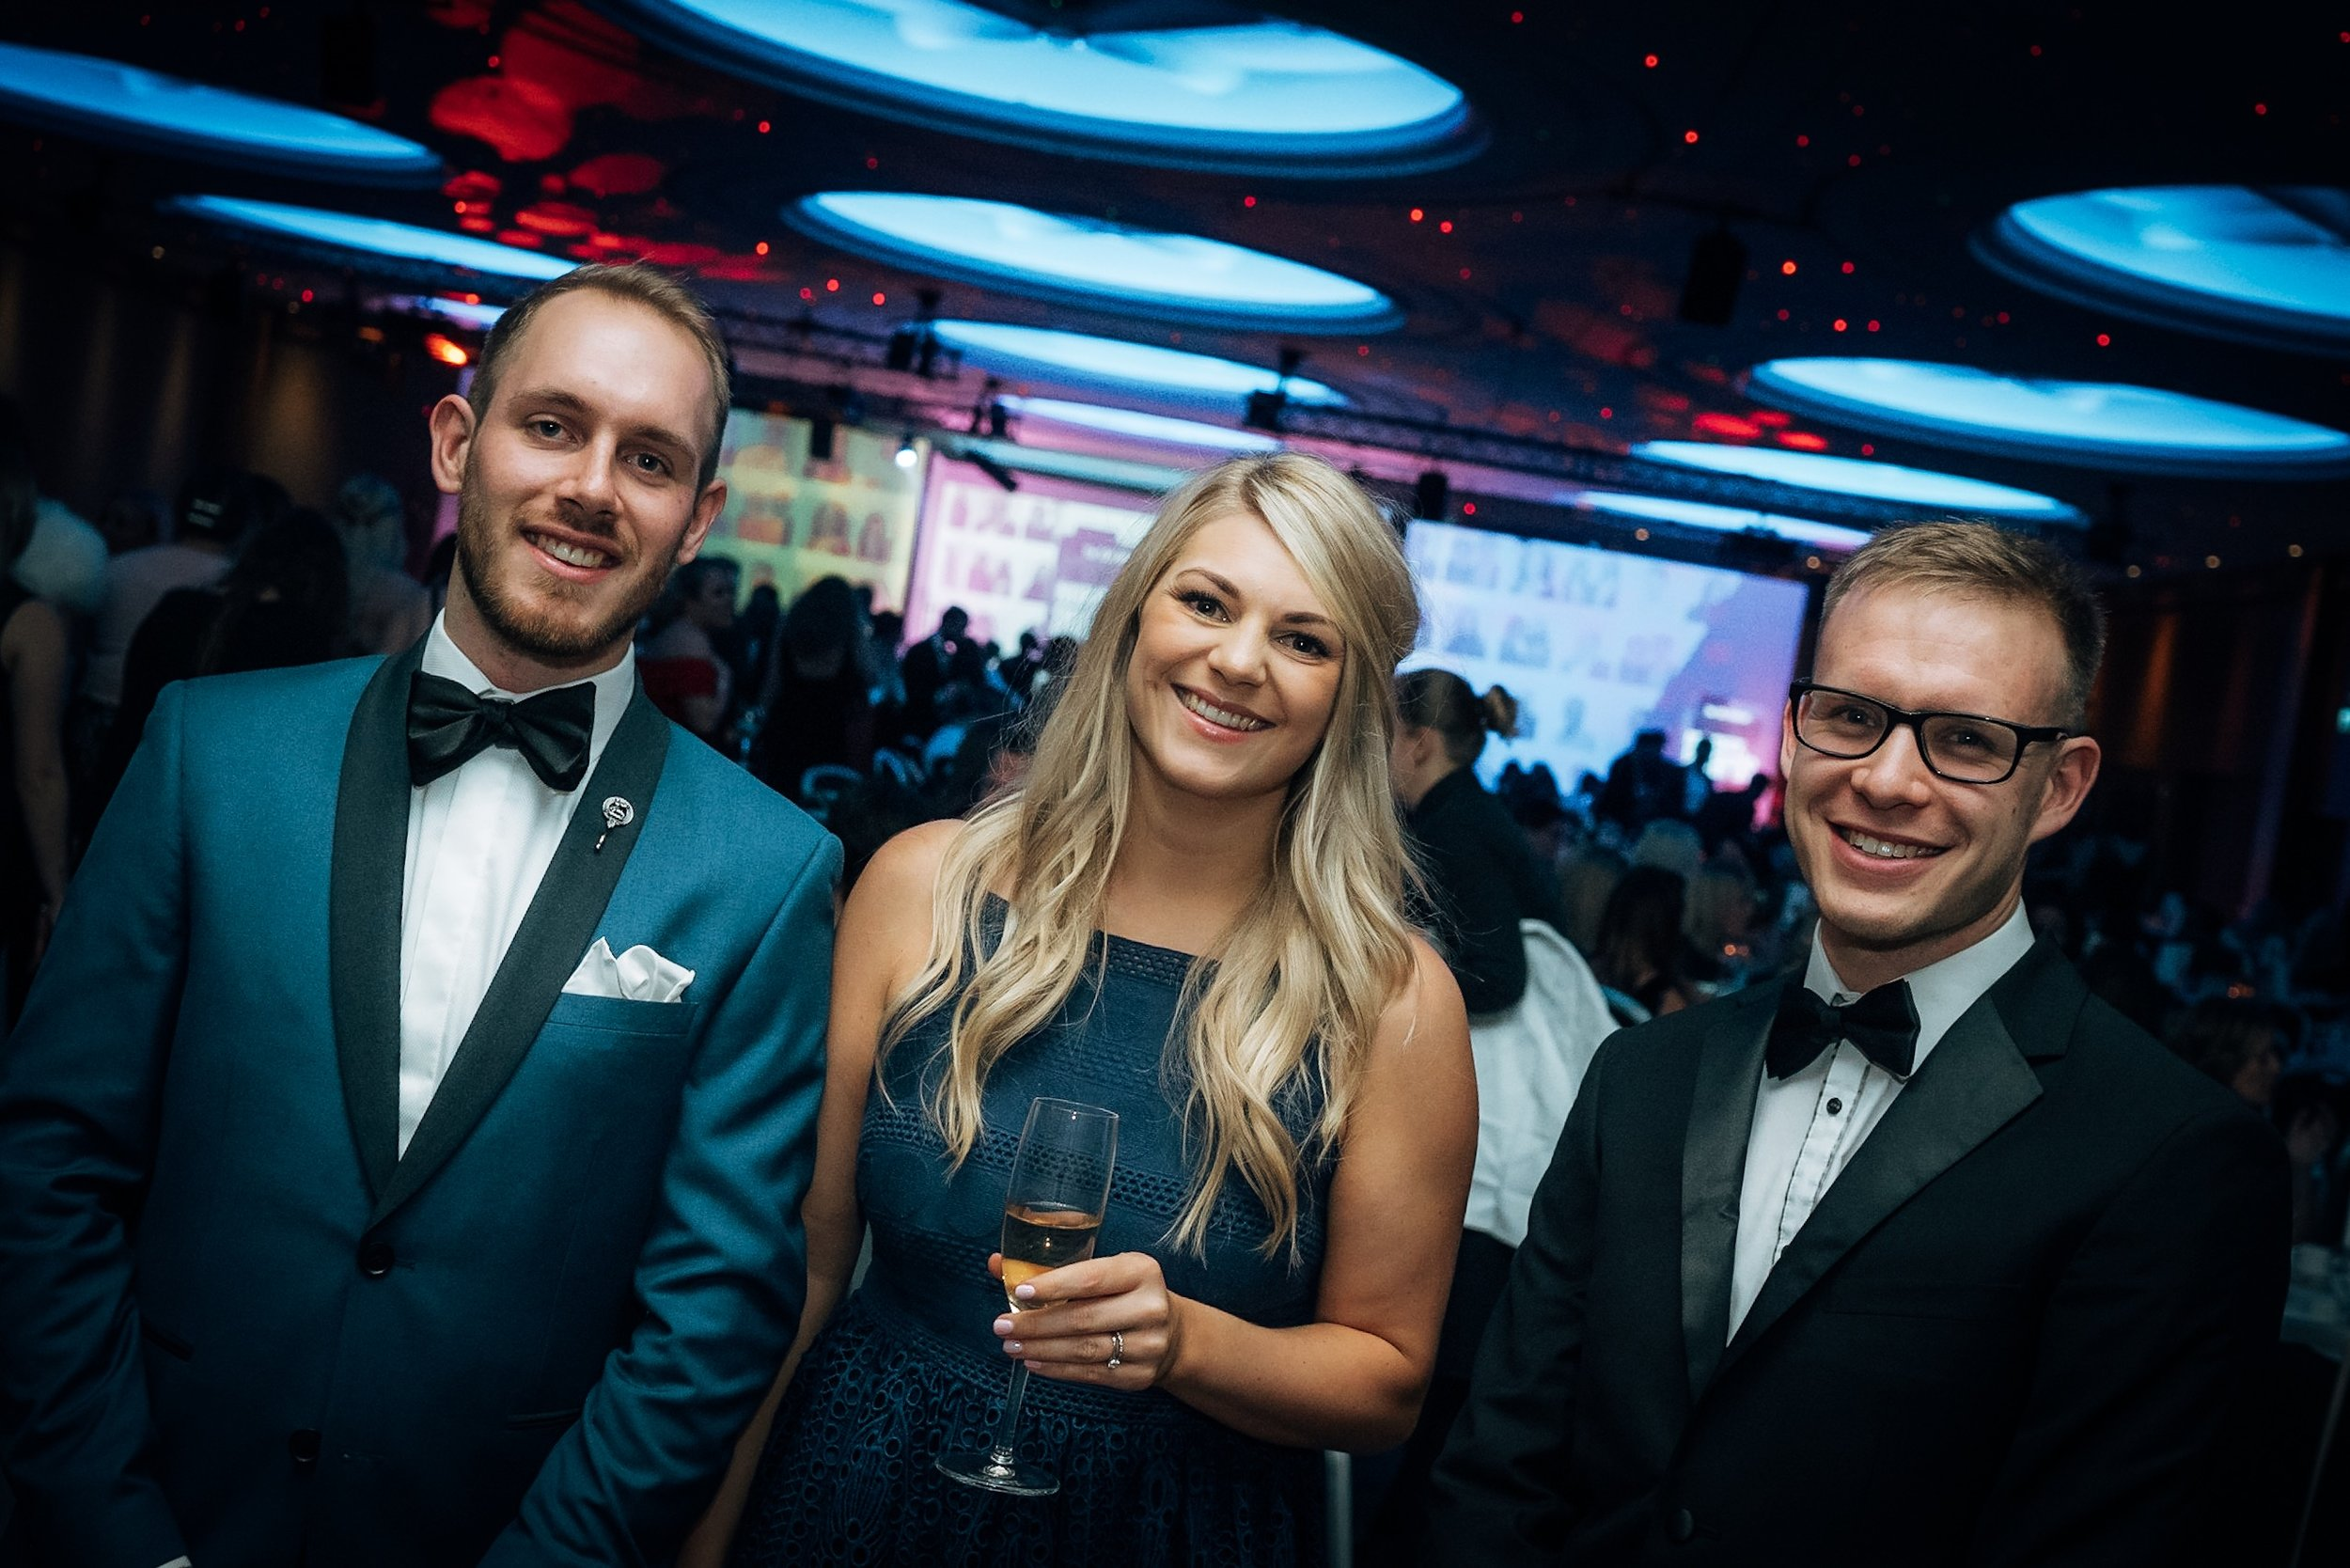 nmt-awards-2018-12-01--2234-228296-009.JPG